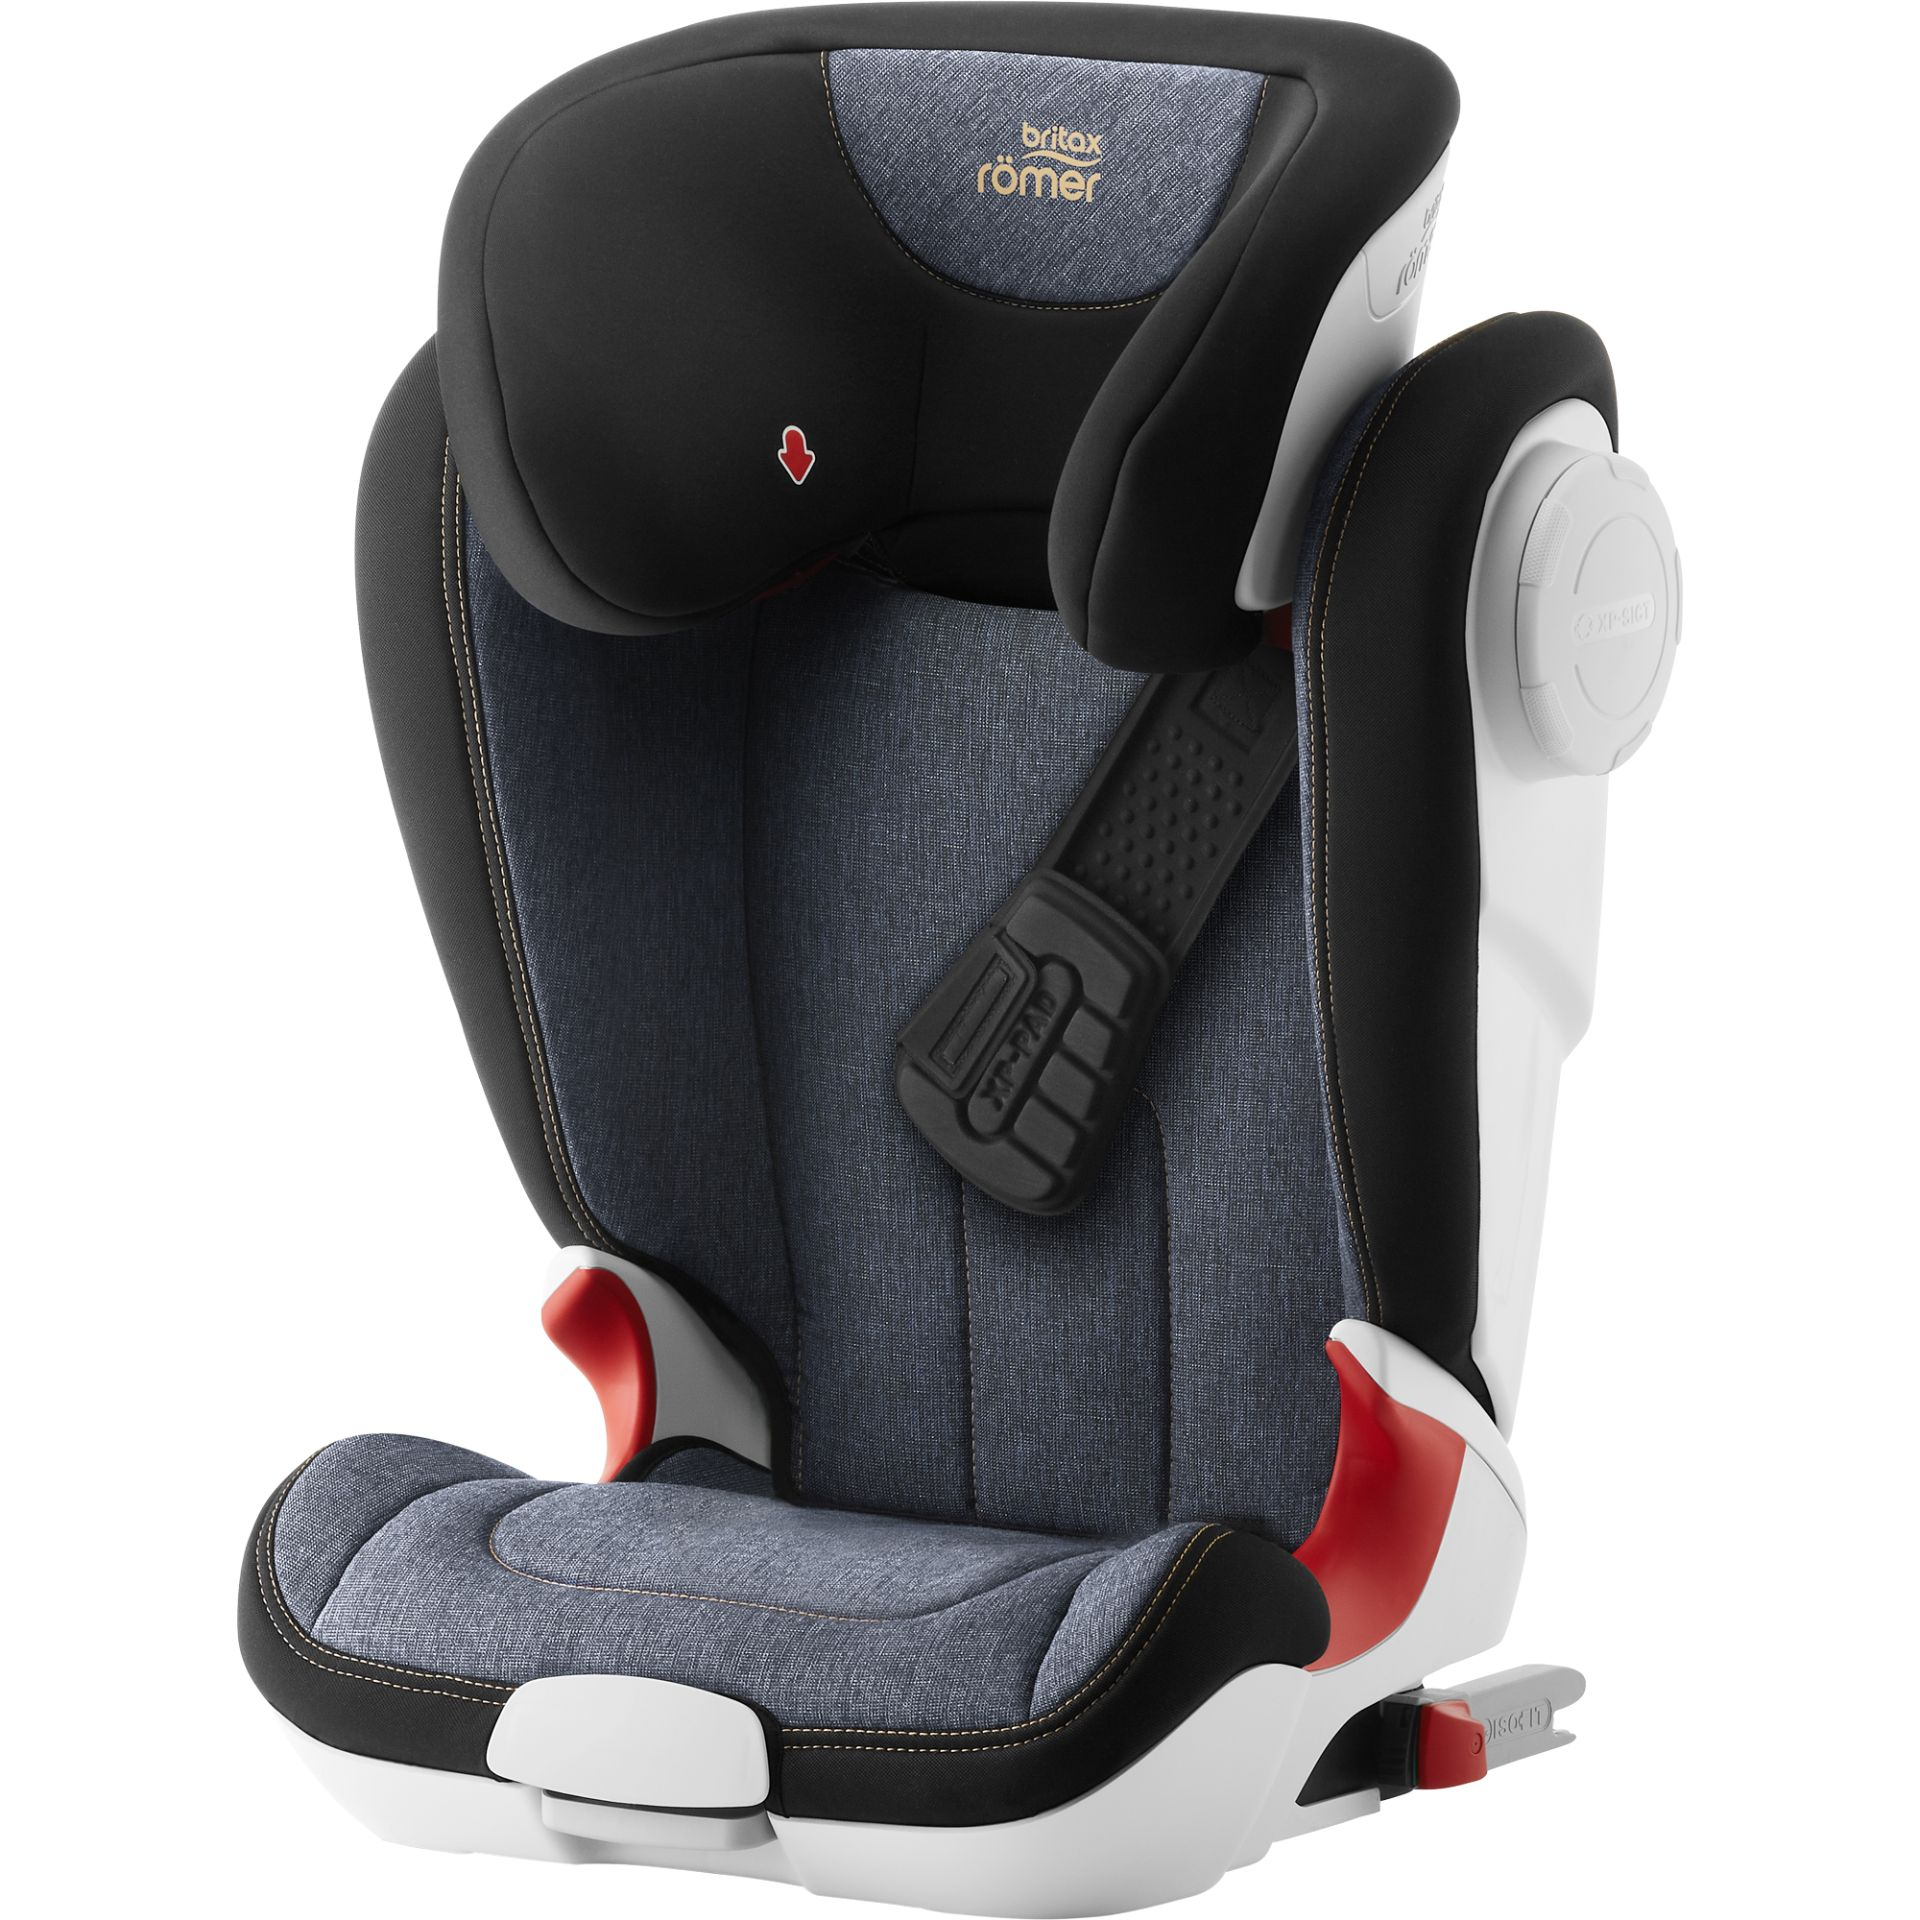 britax r mer child car seat kidfix xp sict 2018 blue. Black Bedroom Furniture Sets. Home Design Ideas